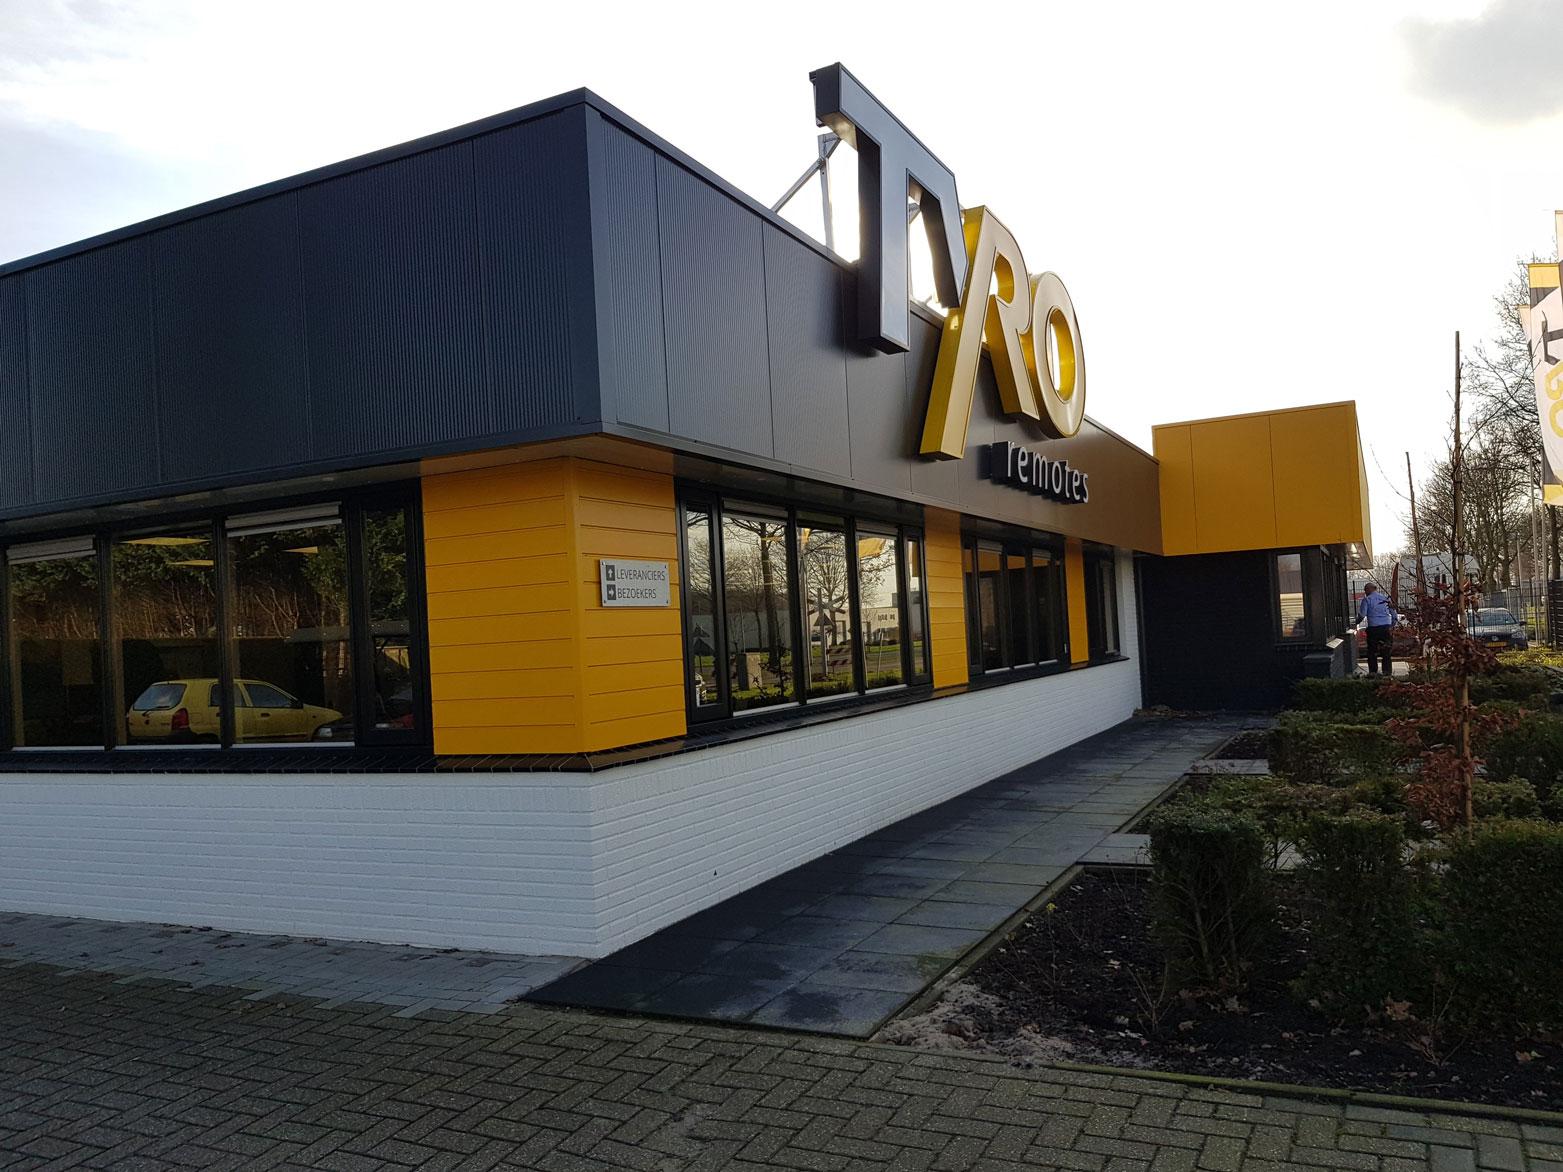 tyro-remote-bedrijfspand-almelo-architect-facelift-van-oord-architectuur-en-design_1